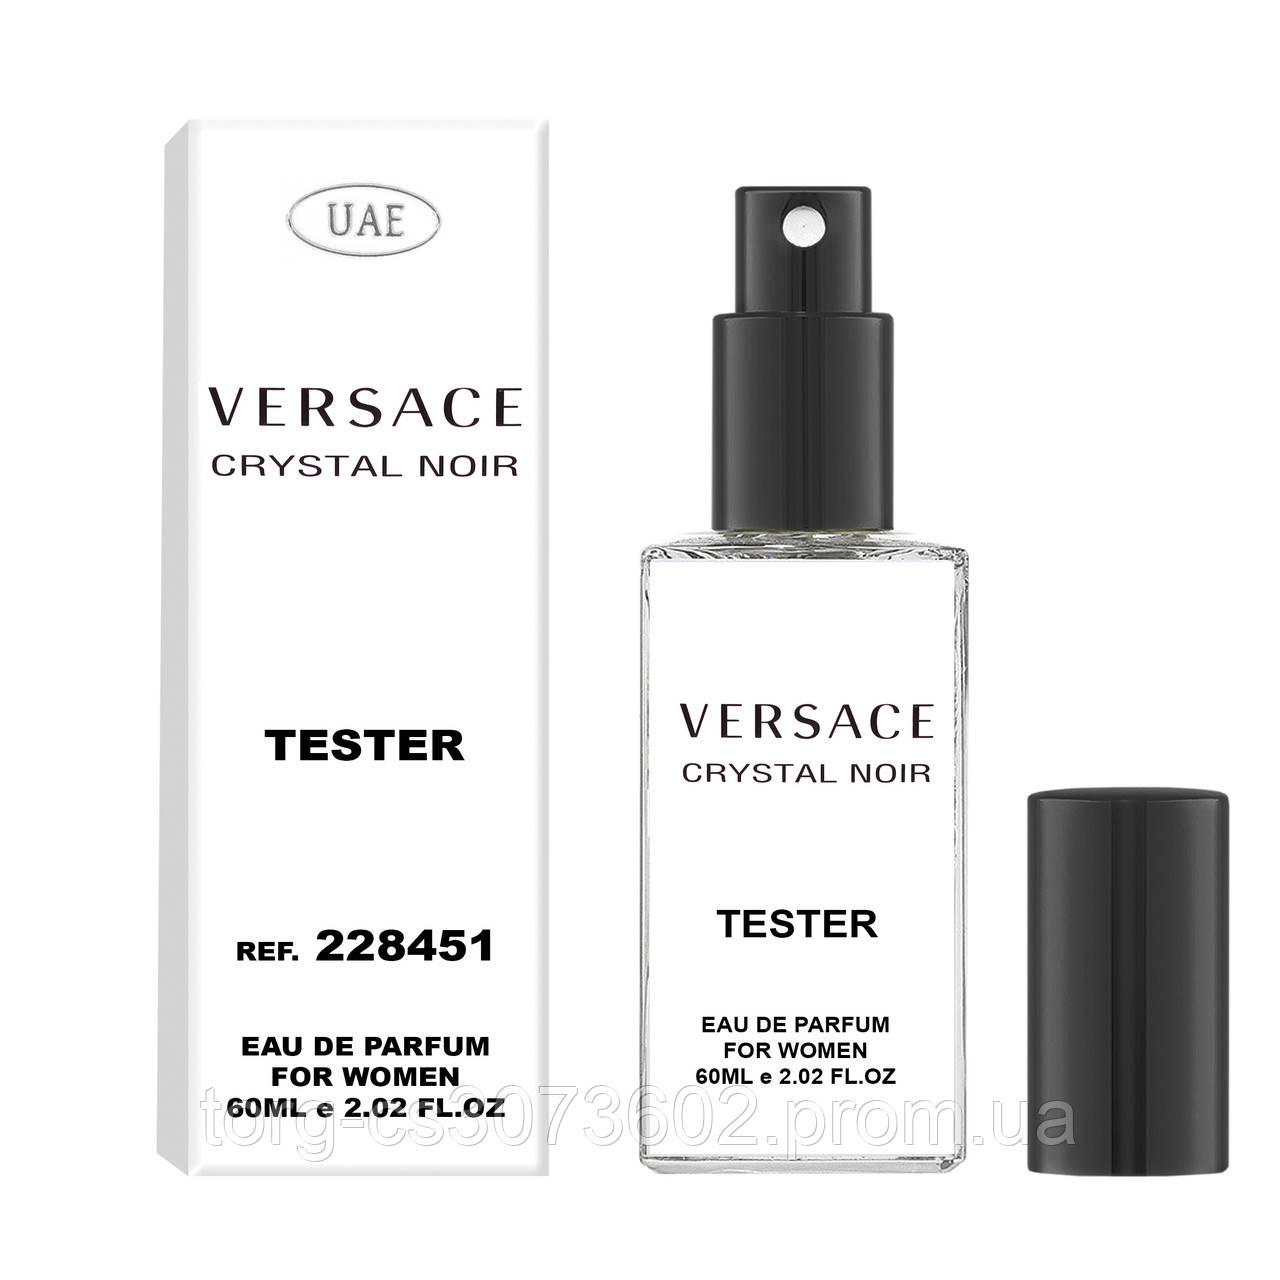 Тестер женский UAE Versace Crystal Noir, 60 мл.